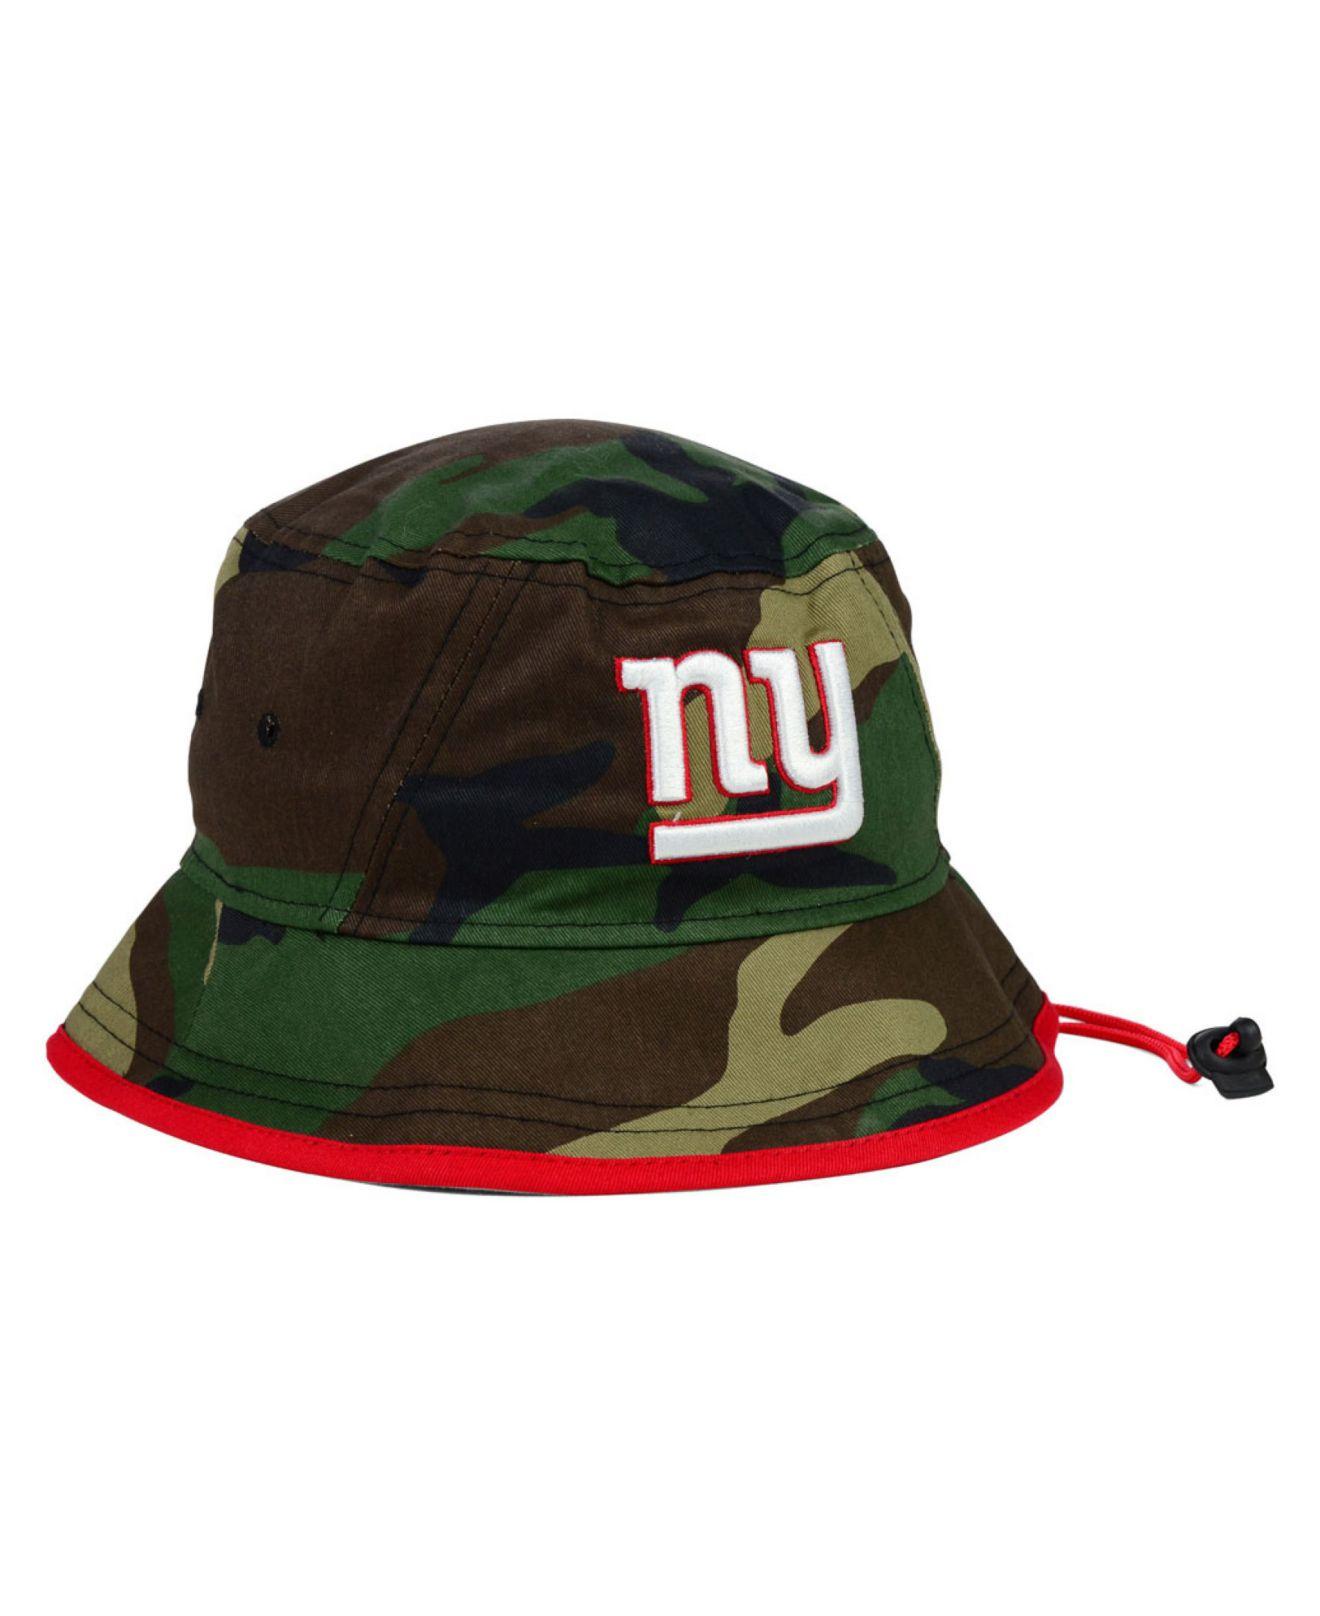 Lyst - KTZ New York Giants Camo Pop Bucket Hat in Green for Men a2ae5b89f24